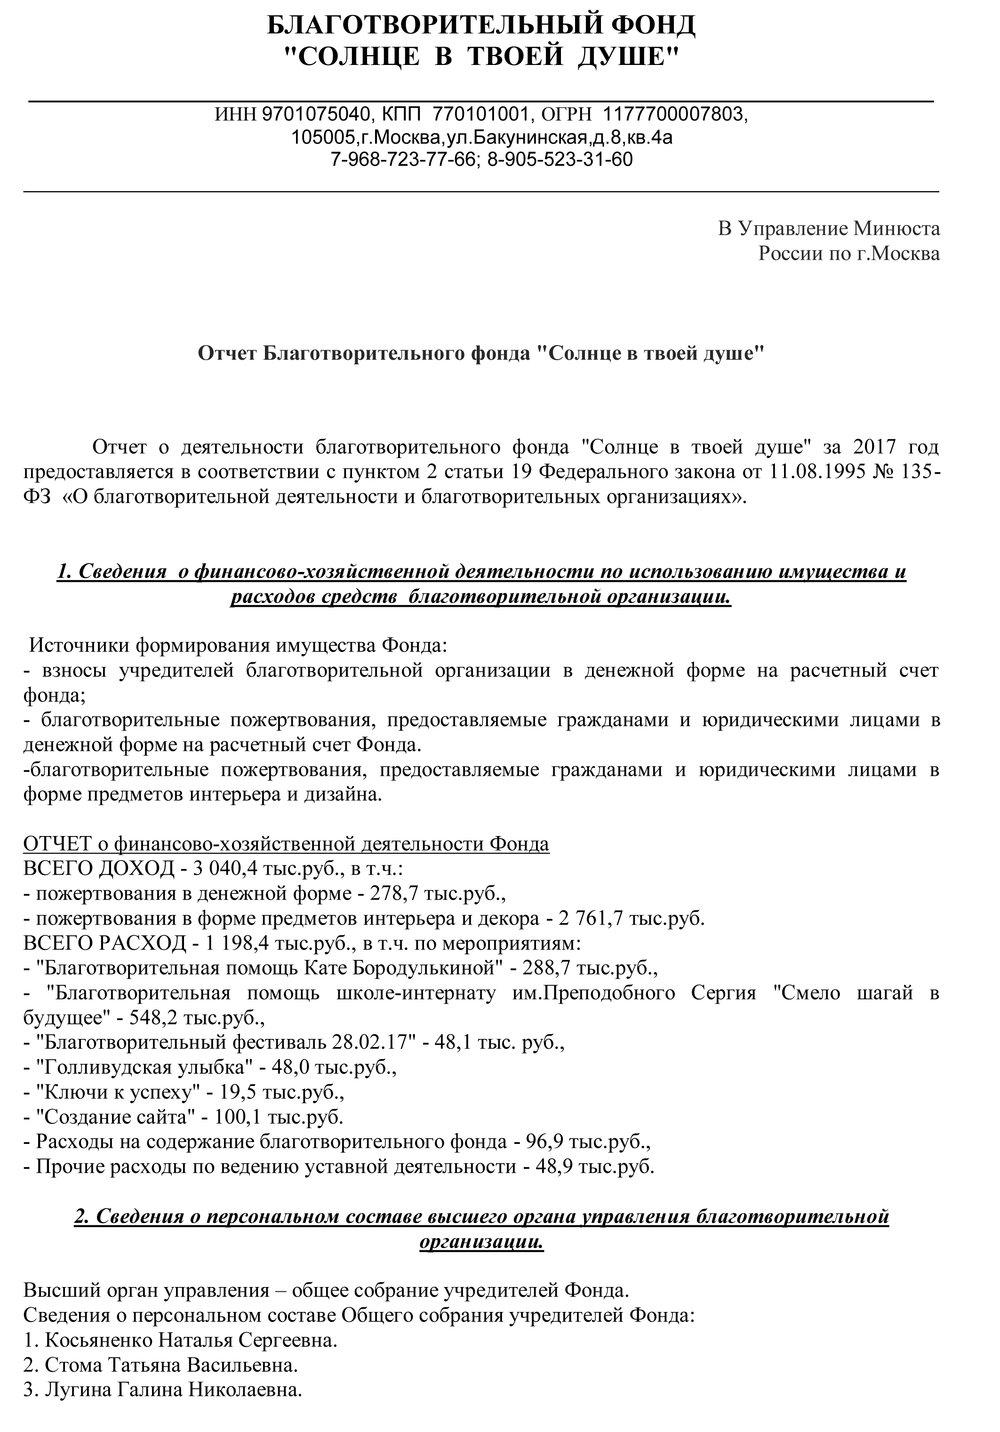 Отчет 2017 уточ1.jpg